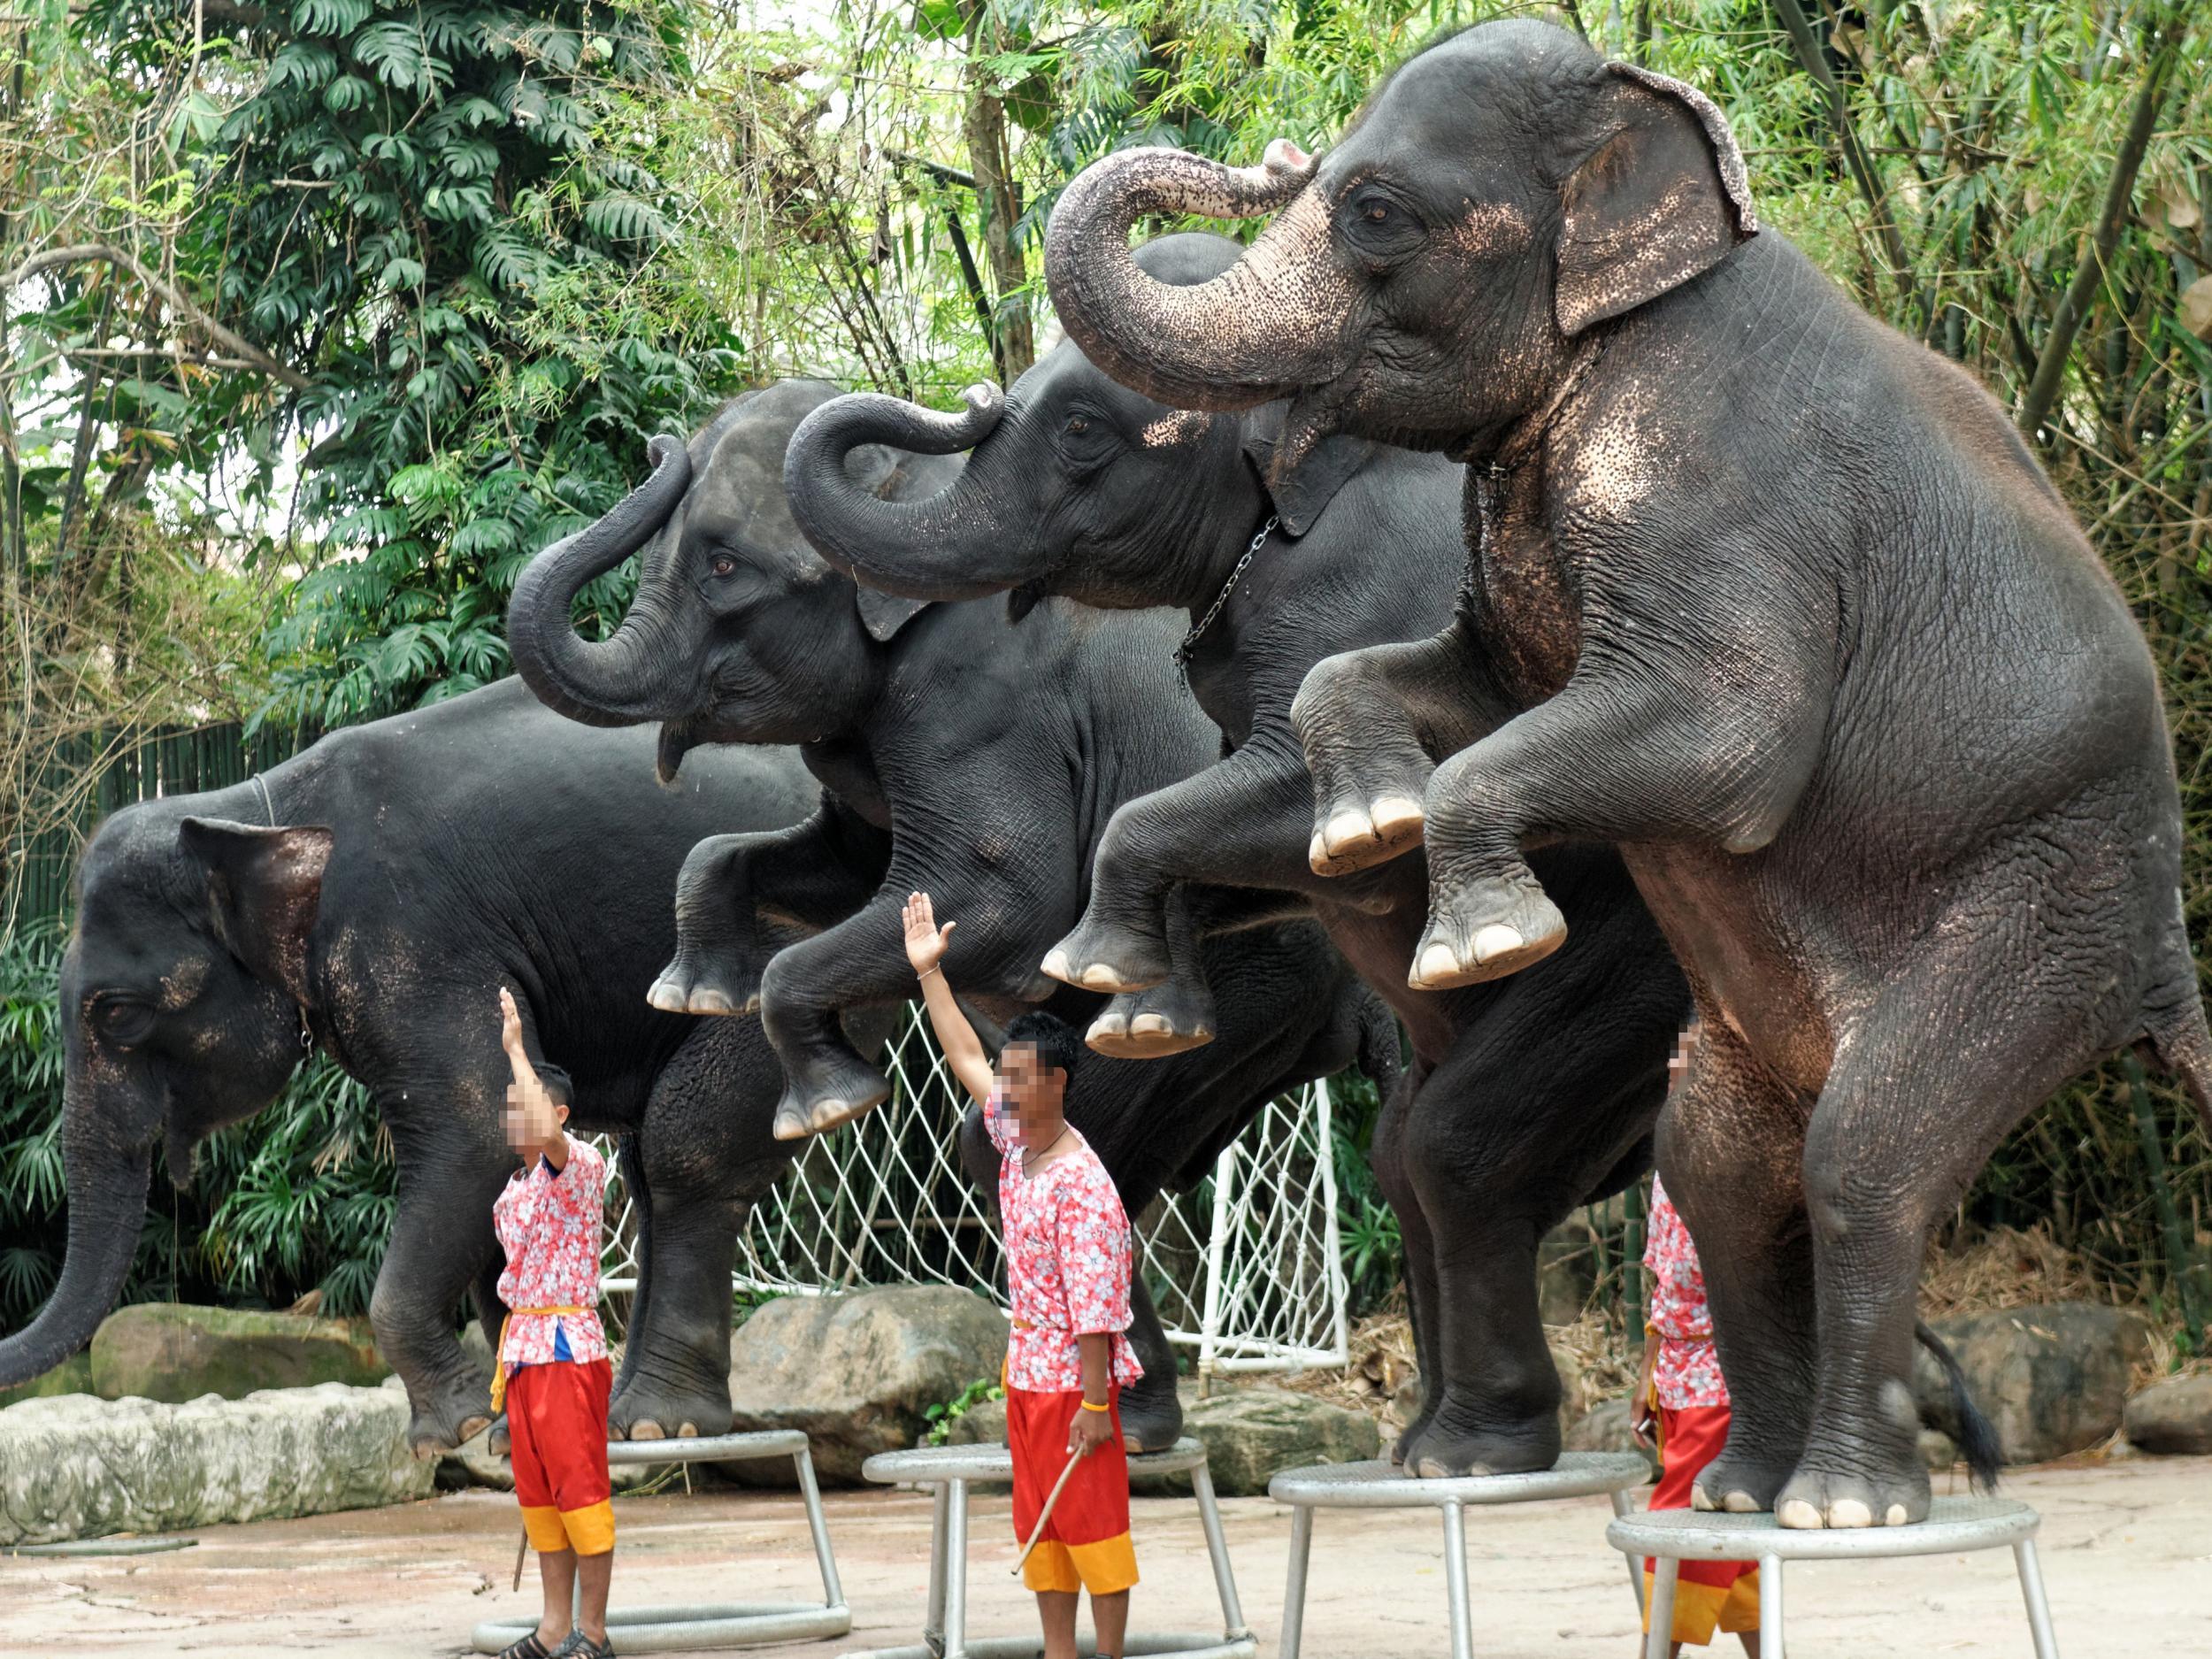 travel associations turning a blind eye to cruel wildlife